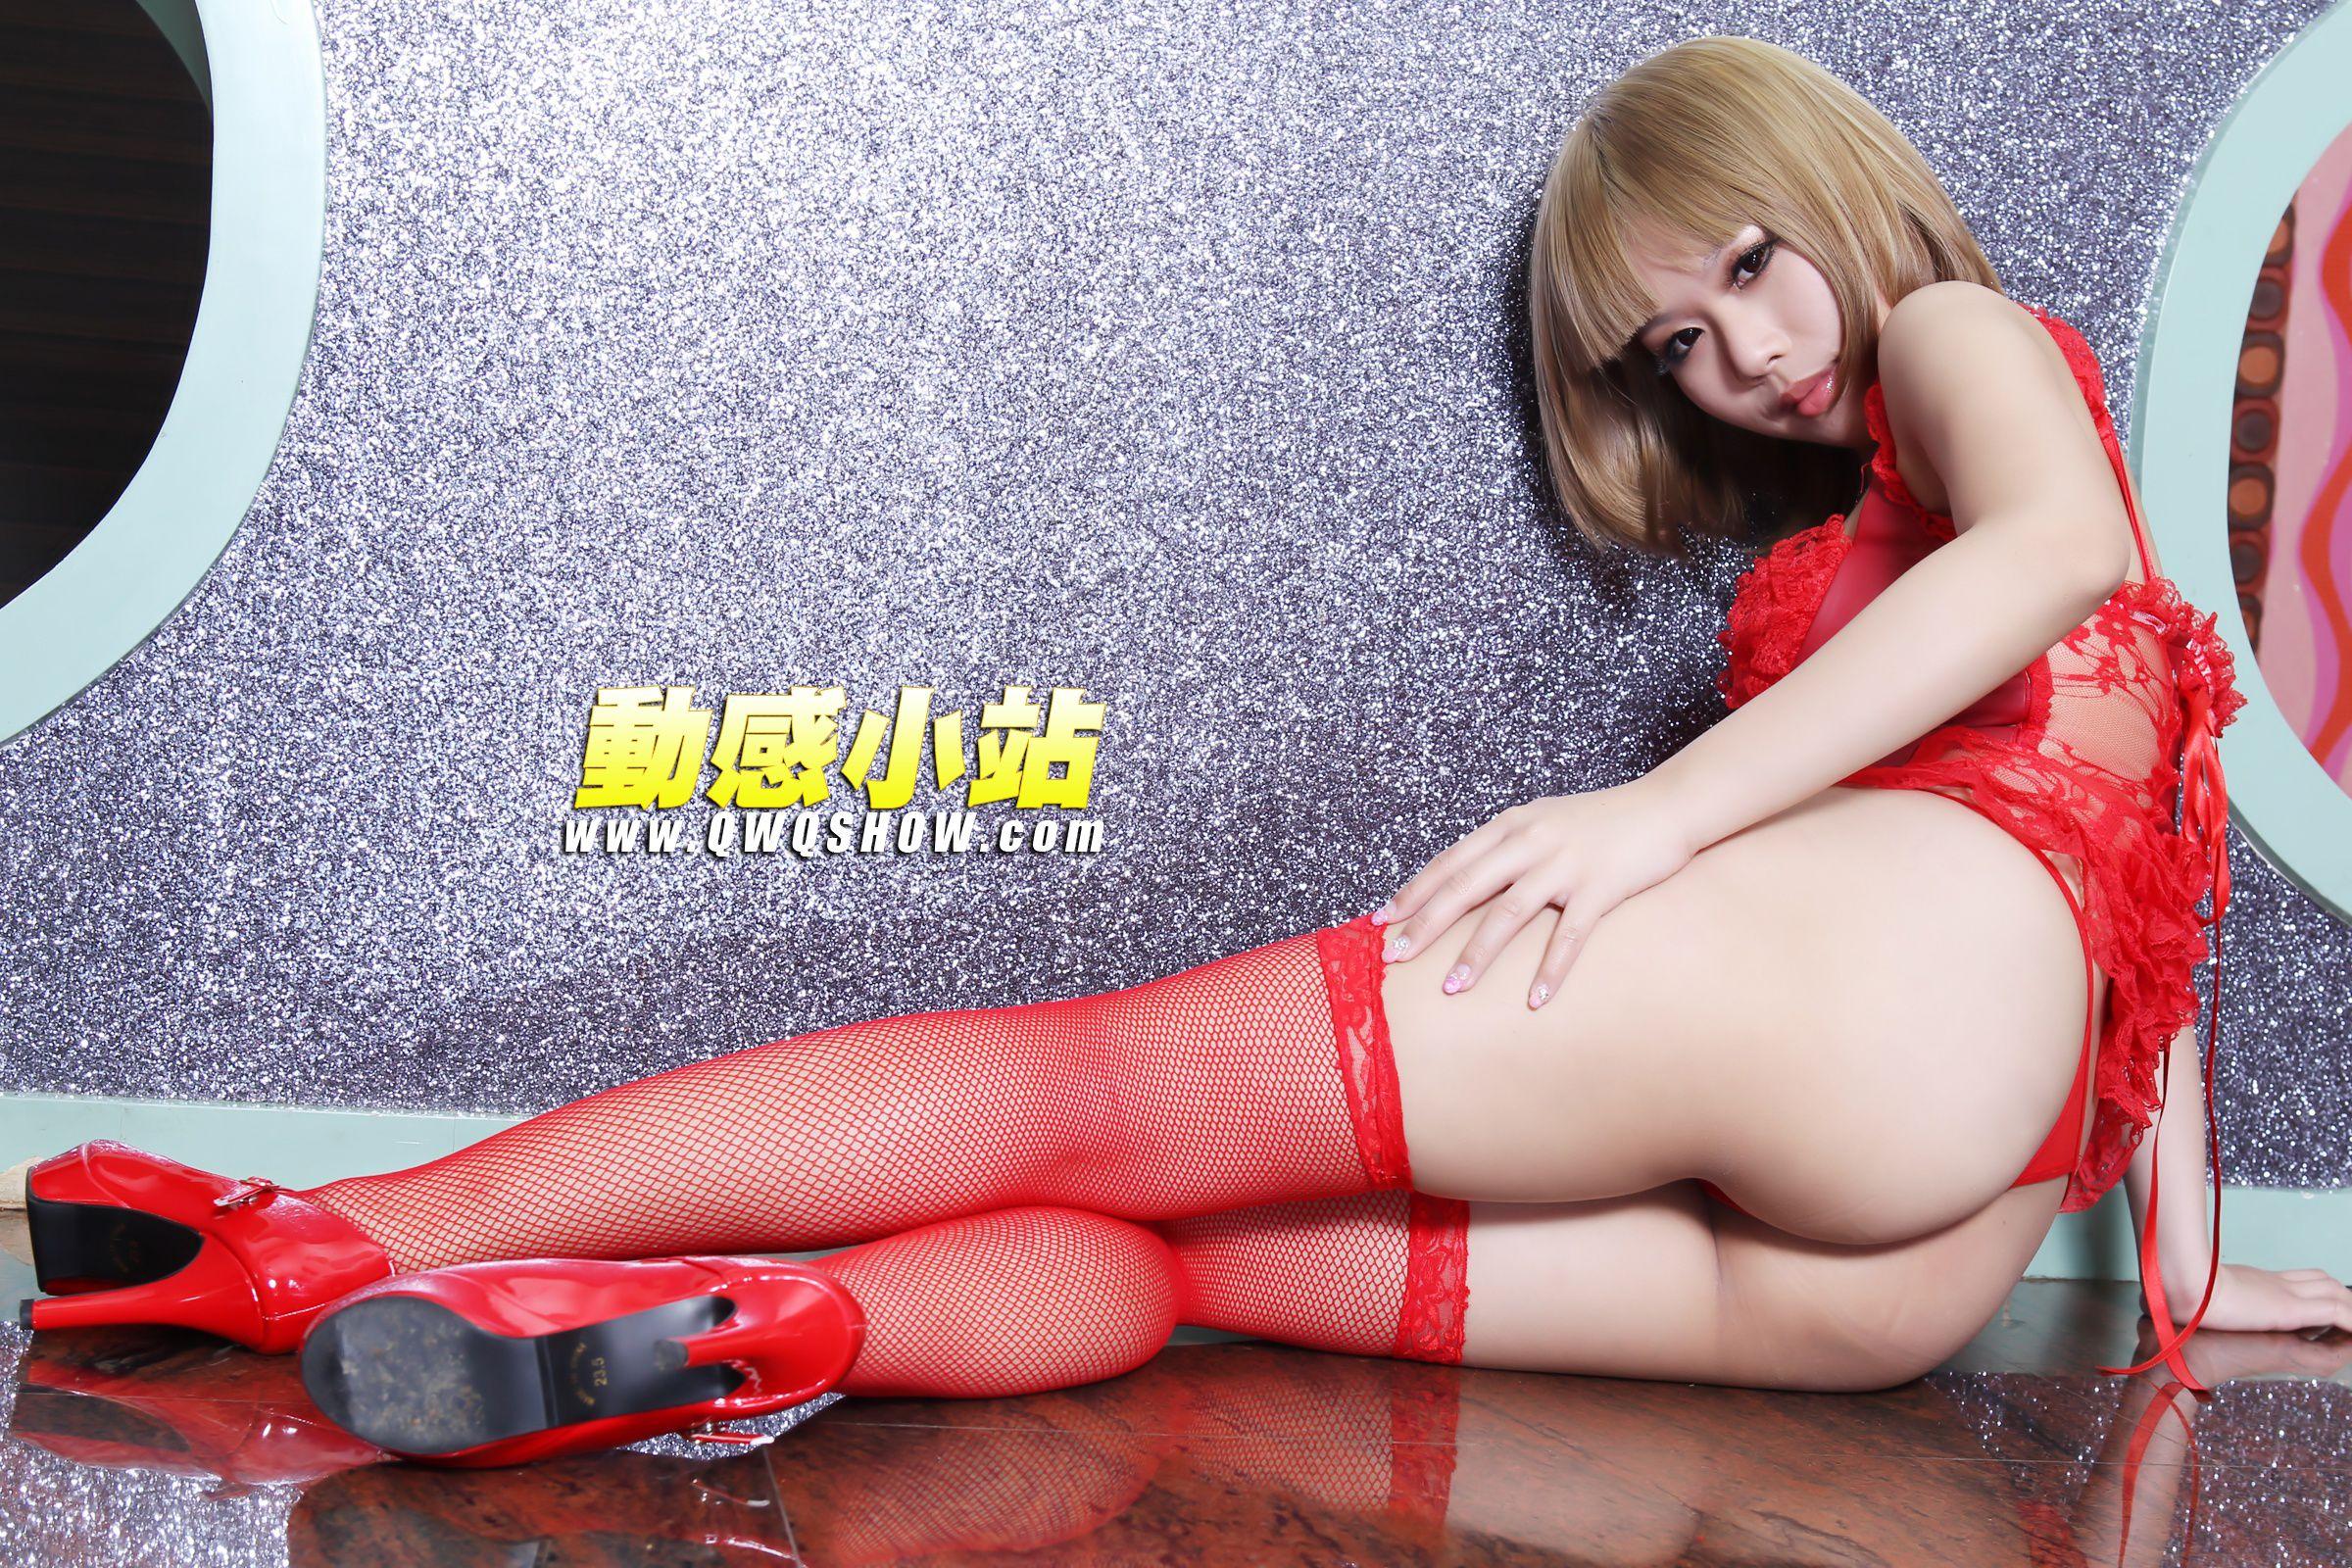 VOL.1452 [动感之星]诱惑情趣内衣网袜红色丝袜:妖精(动感小站妖精,动感之星妖精)高品质写真套图(74P)